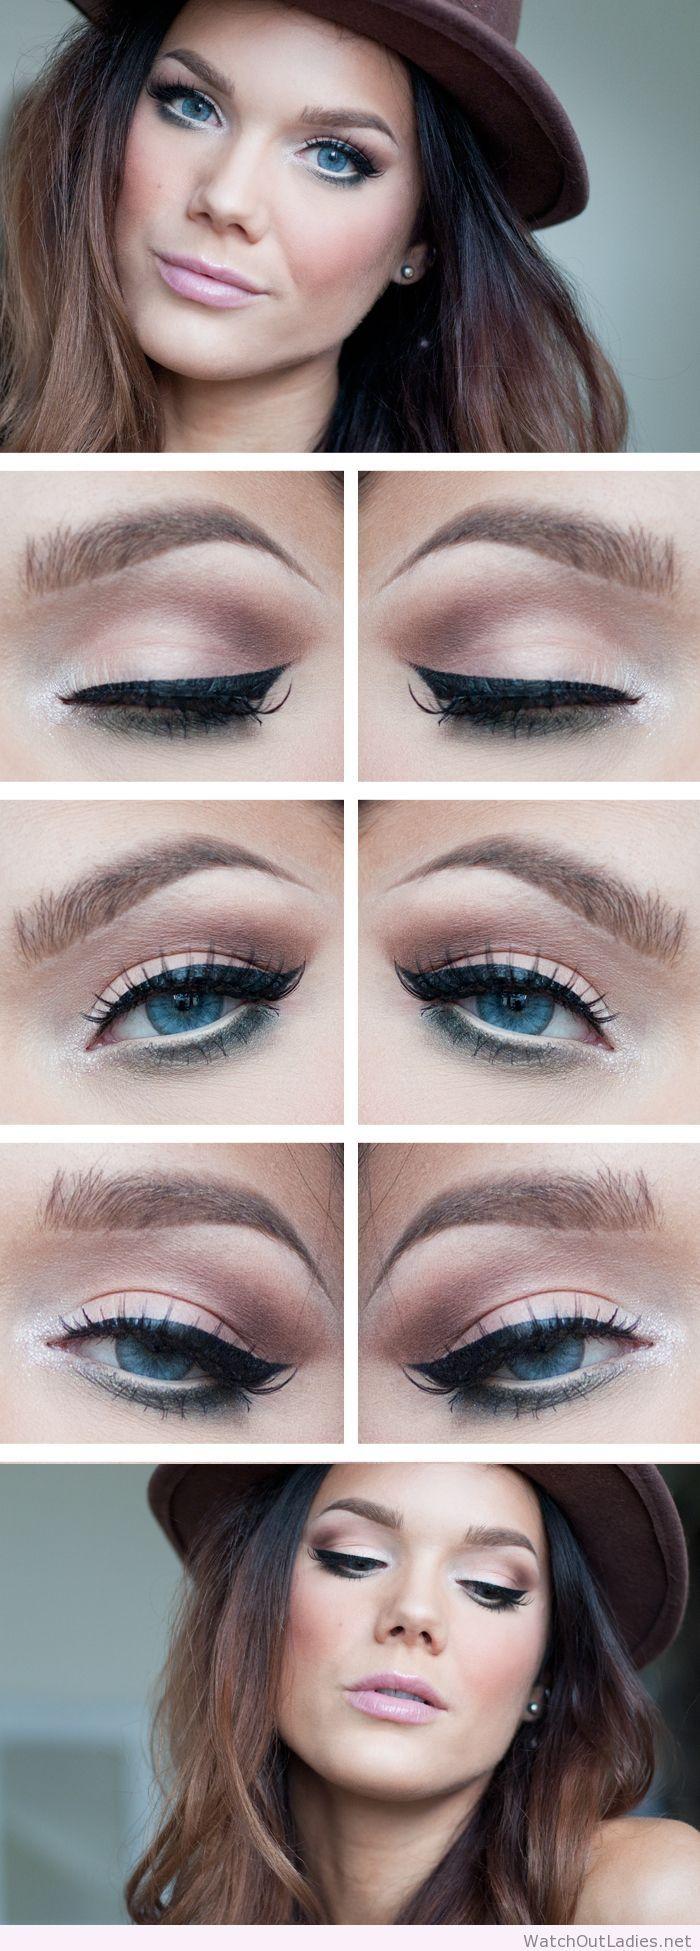 Linda Hallberg natural eye makeup with black